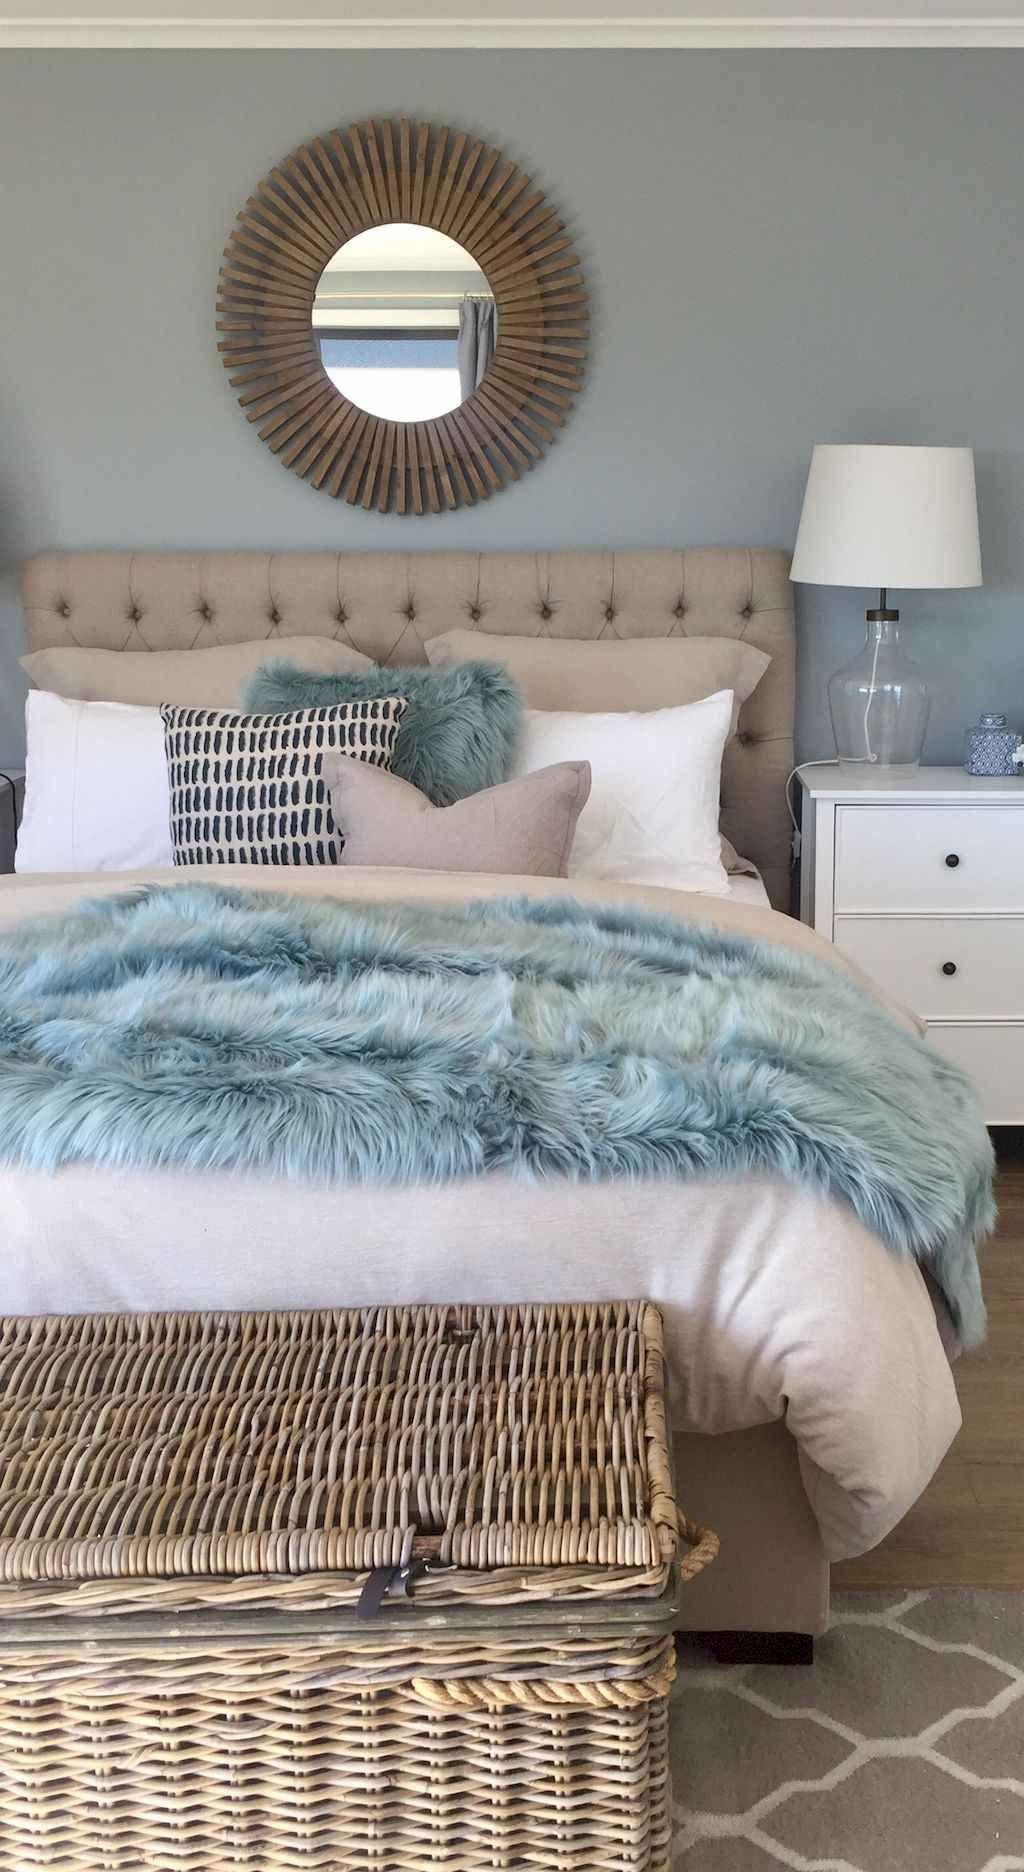 60 Rustic Coastal Master Bedroom Ideas Coastal Bedroom